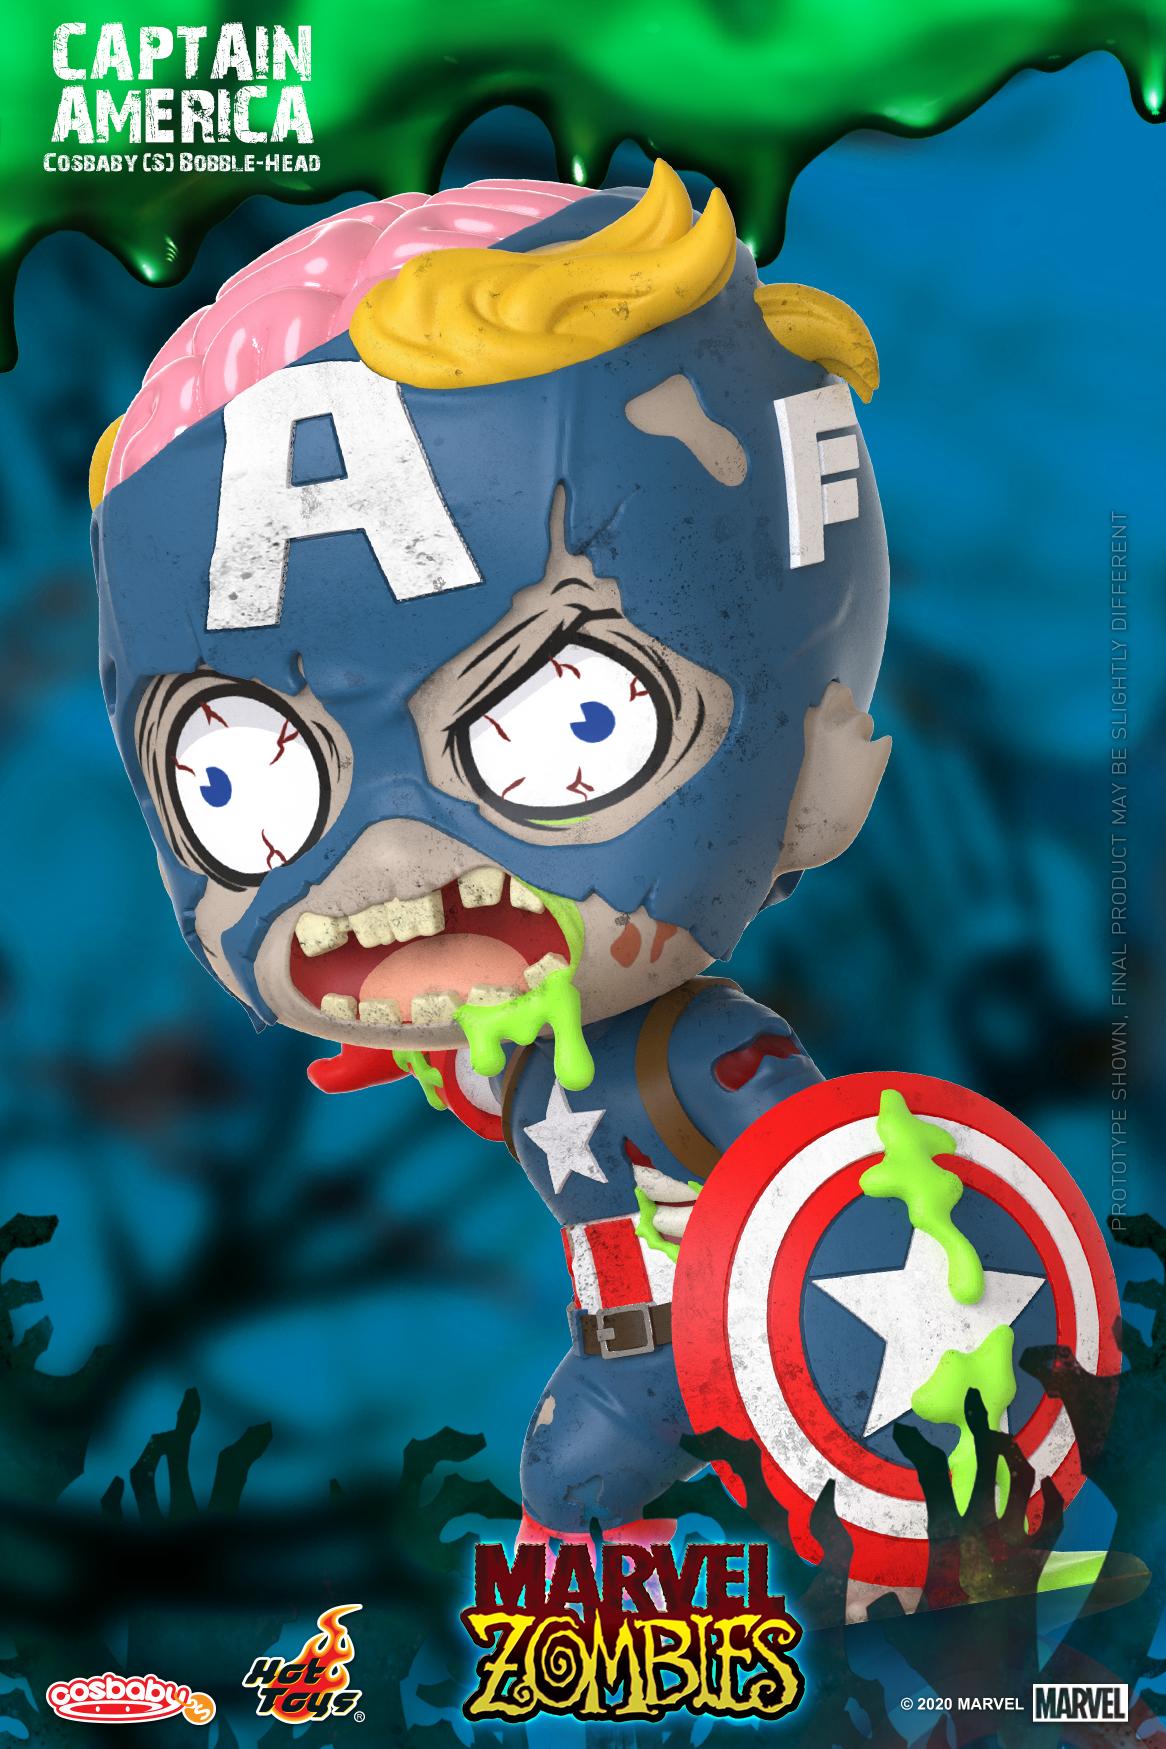 Hot-Toys-Marvel-Zombie-Captain-America-Cosbaby-S_PR2-1